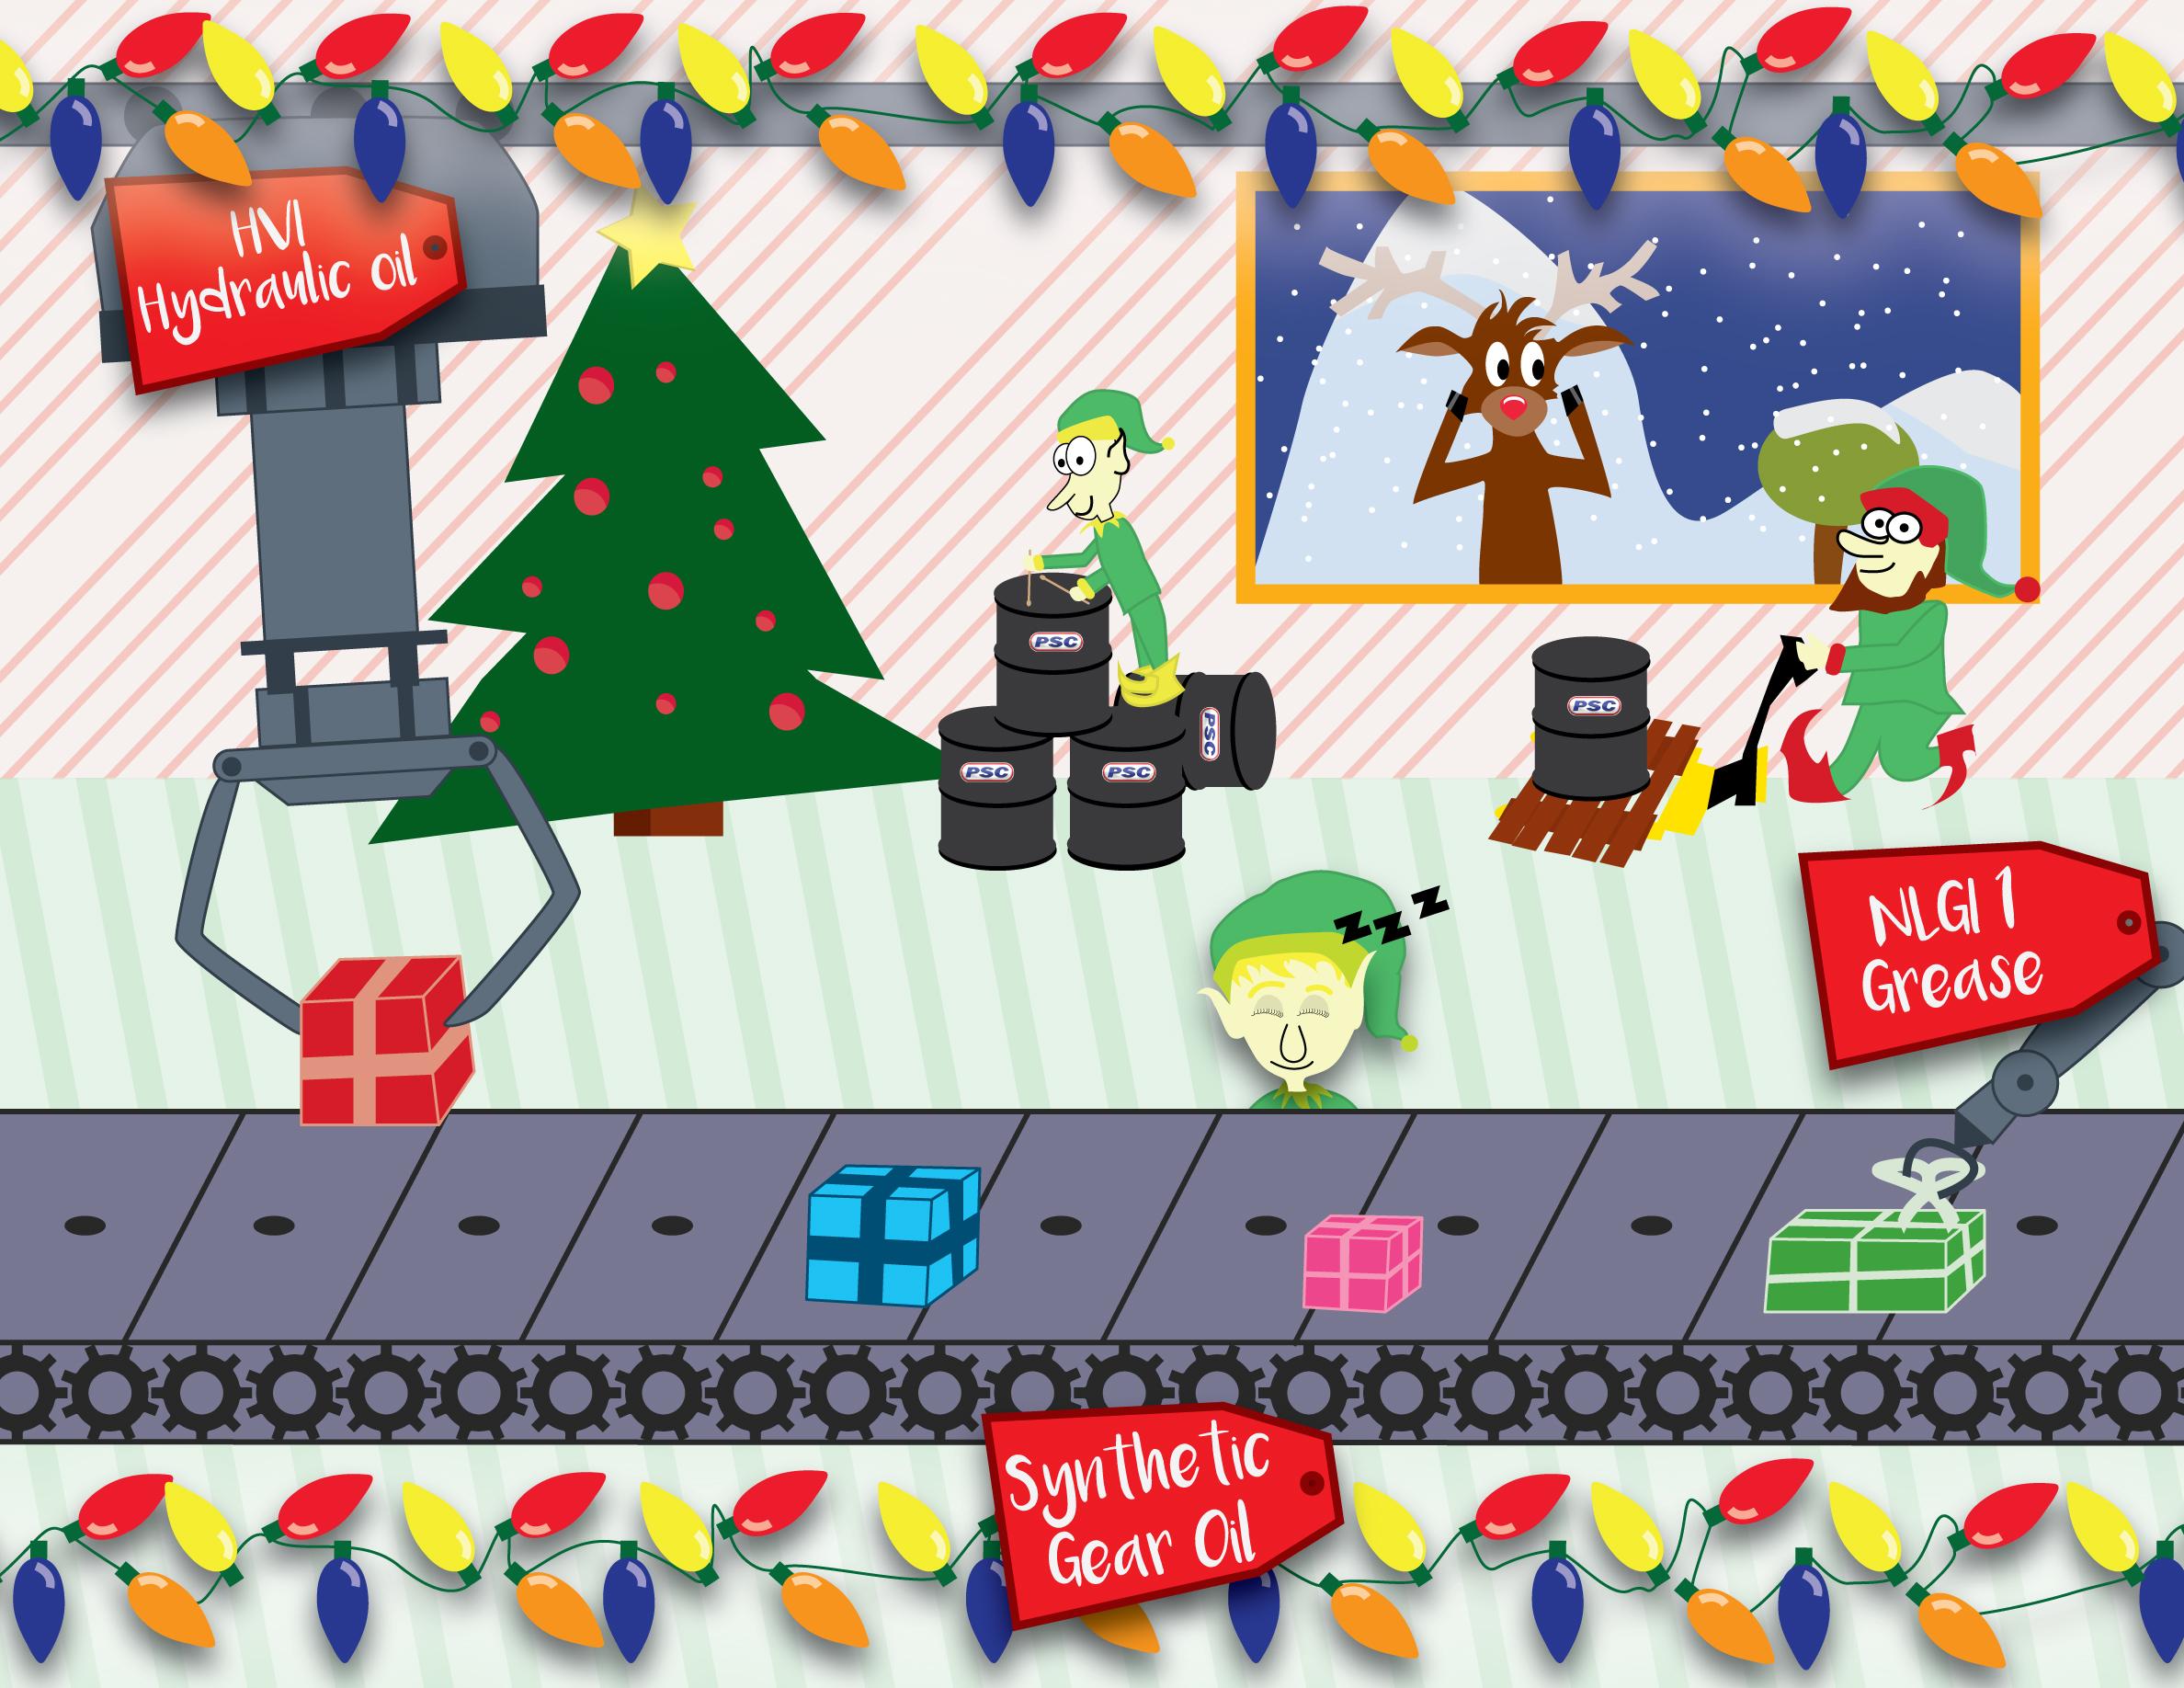 cold weather lubricants, PSC, santa, santa's workshop, north pole